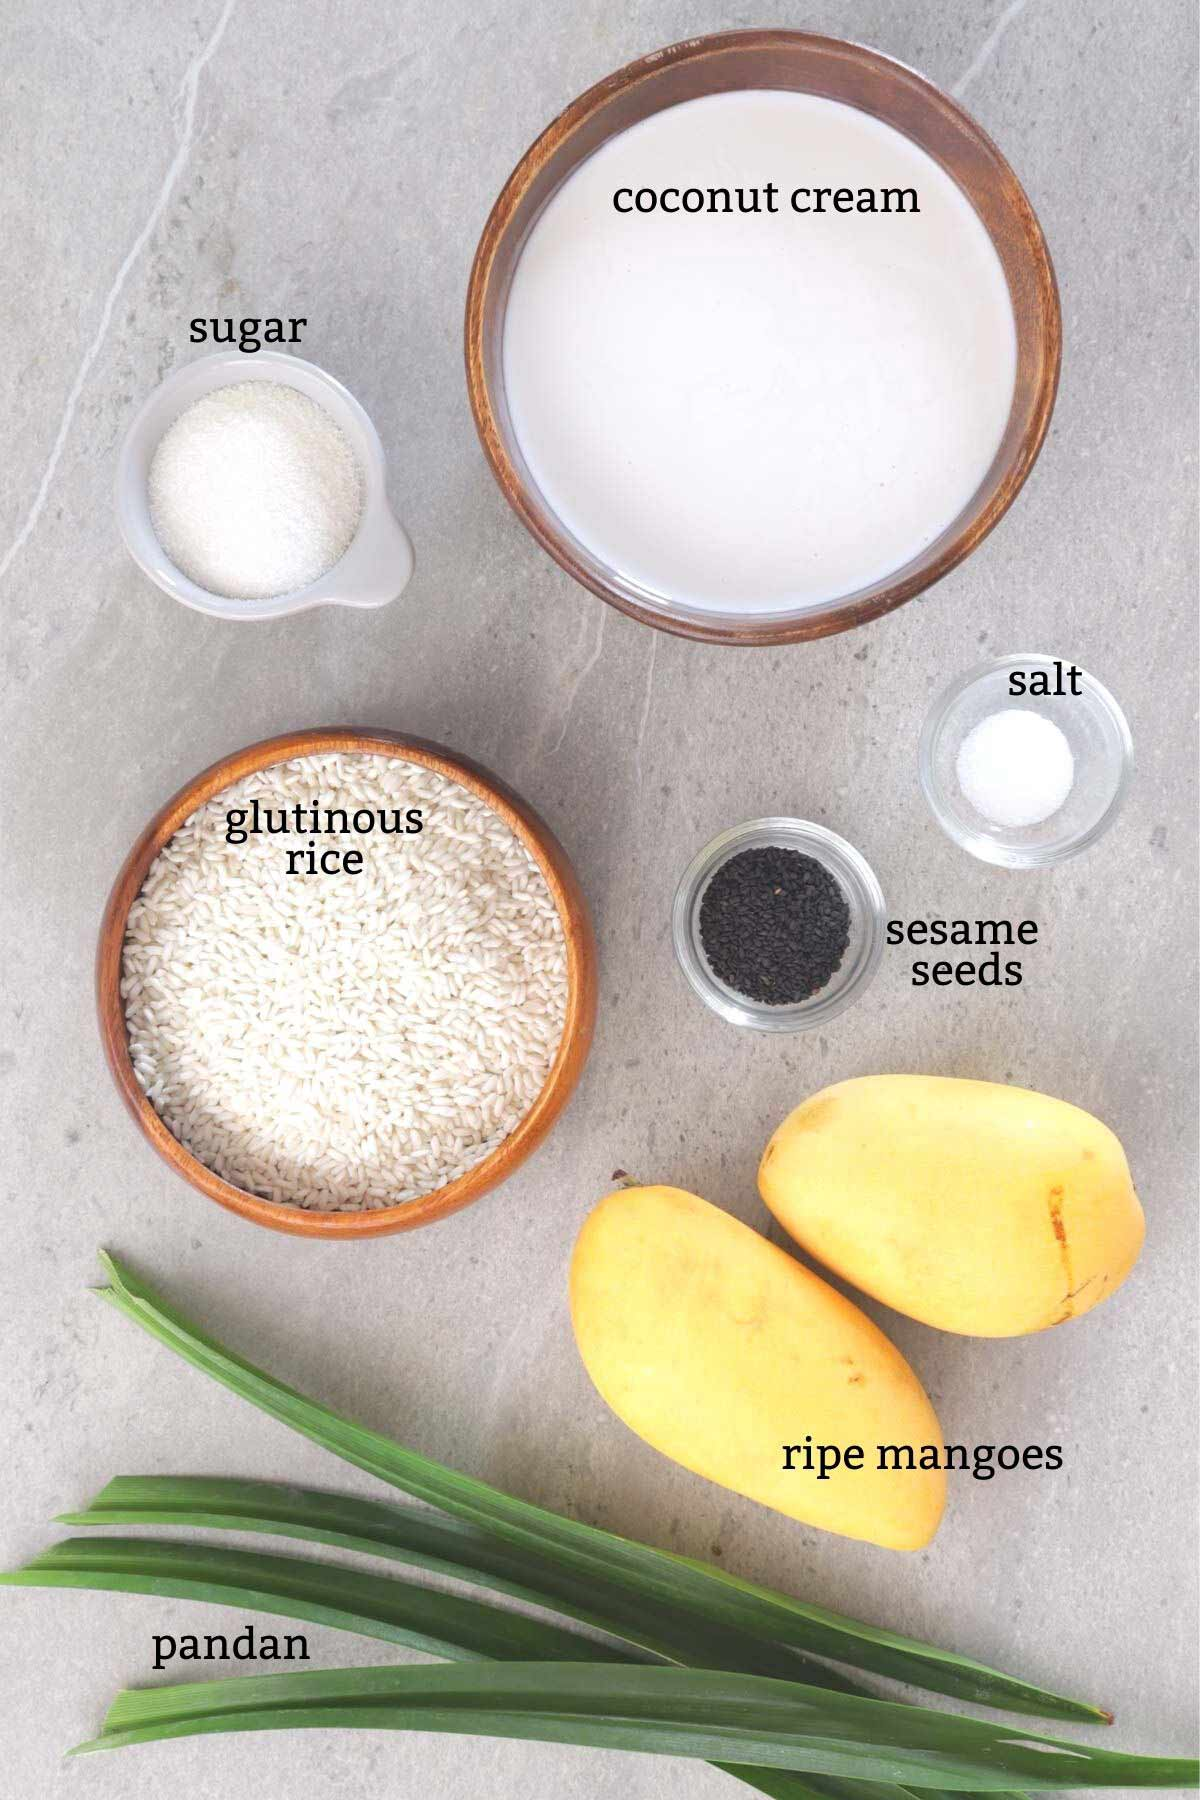 Ingredienst for making Mango Sticky Rice